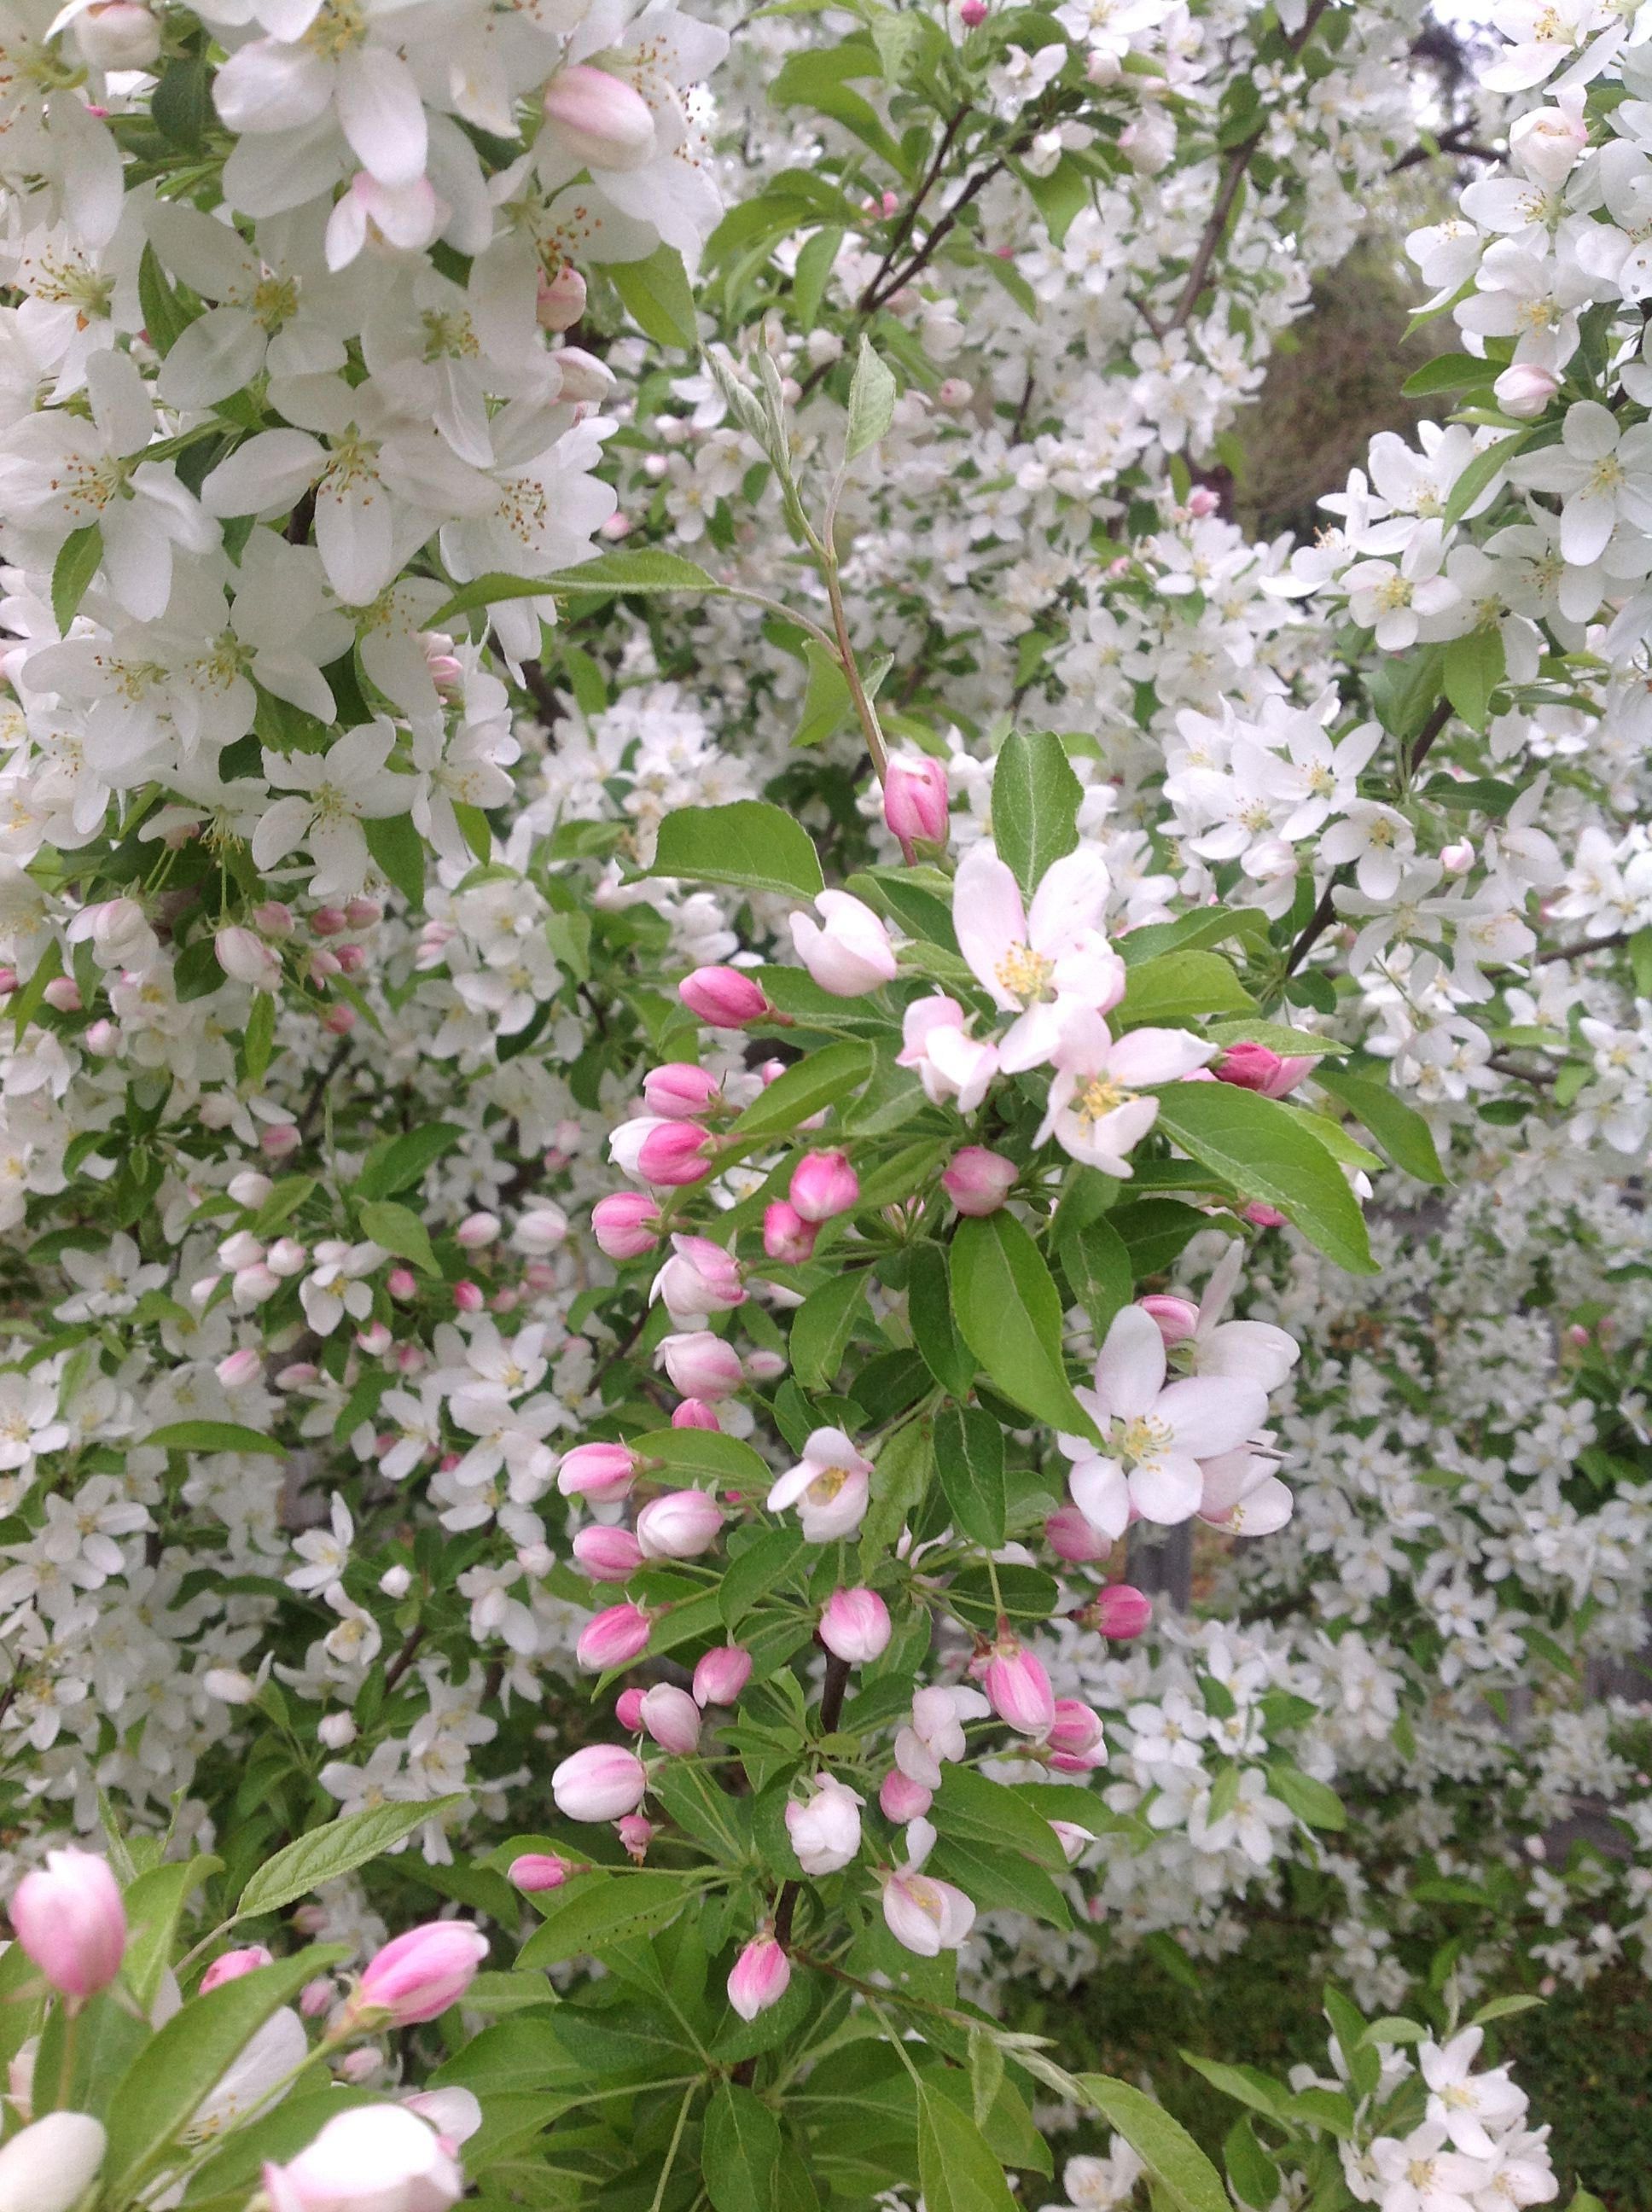 Crab Apple Tree | Front yard plants, Crabapple tree, Front ...